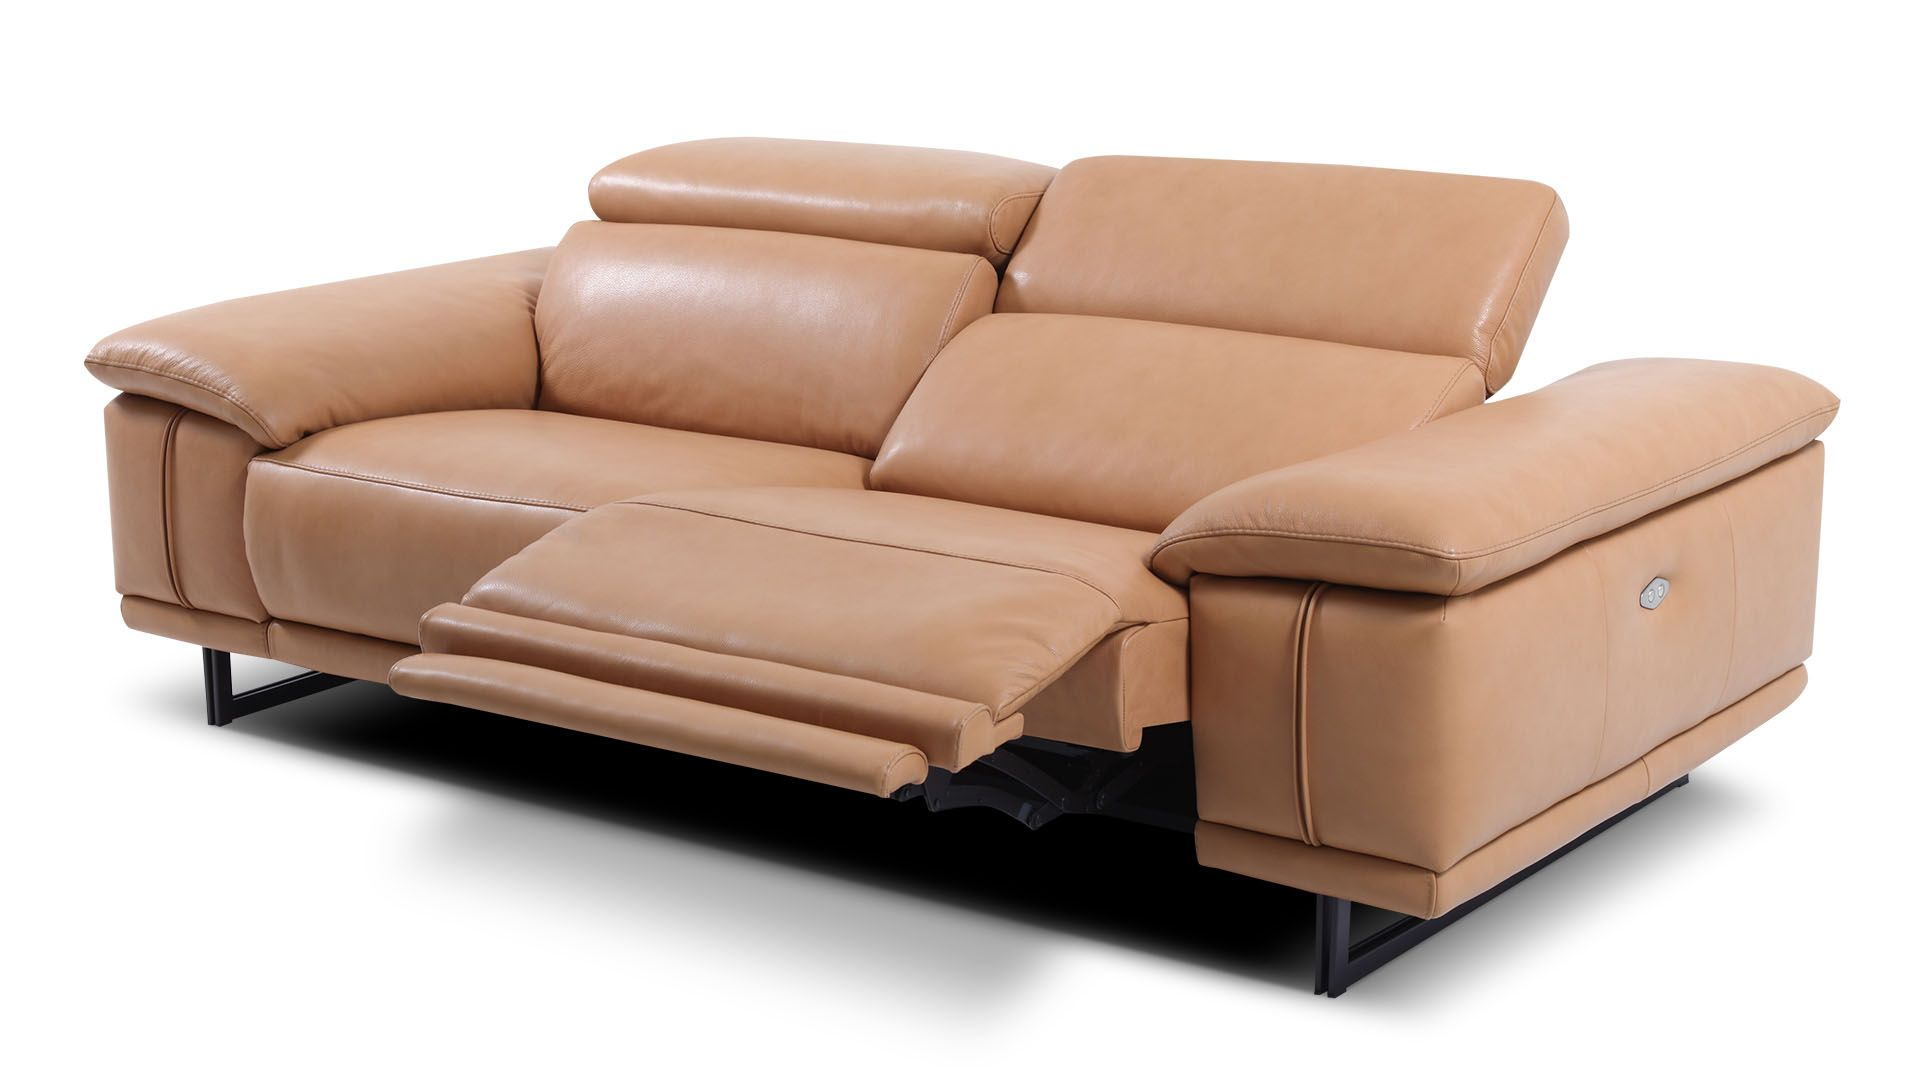 Macan Kermes pohovky Relaxačn sedačky a křesla